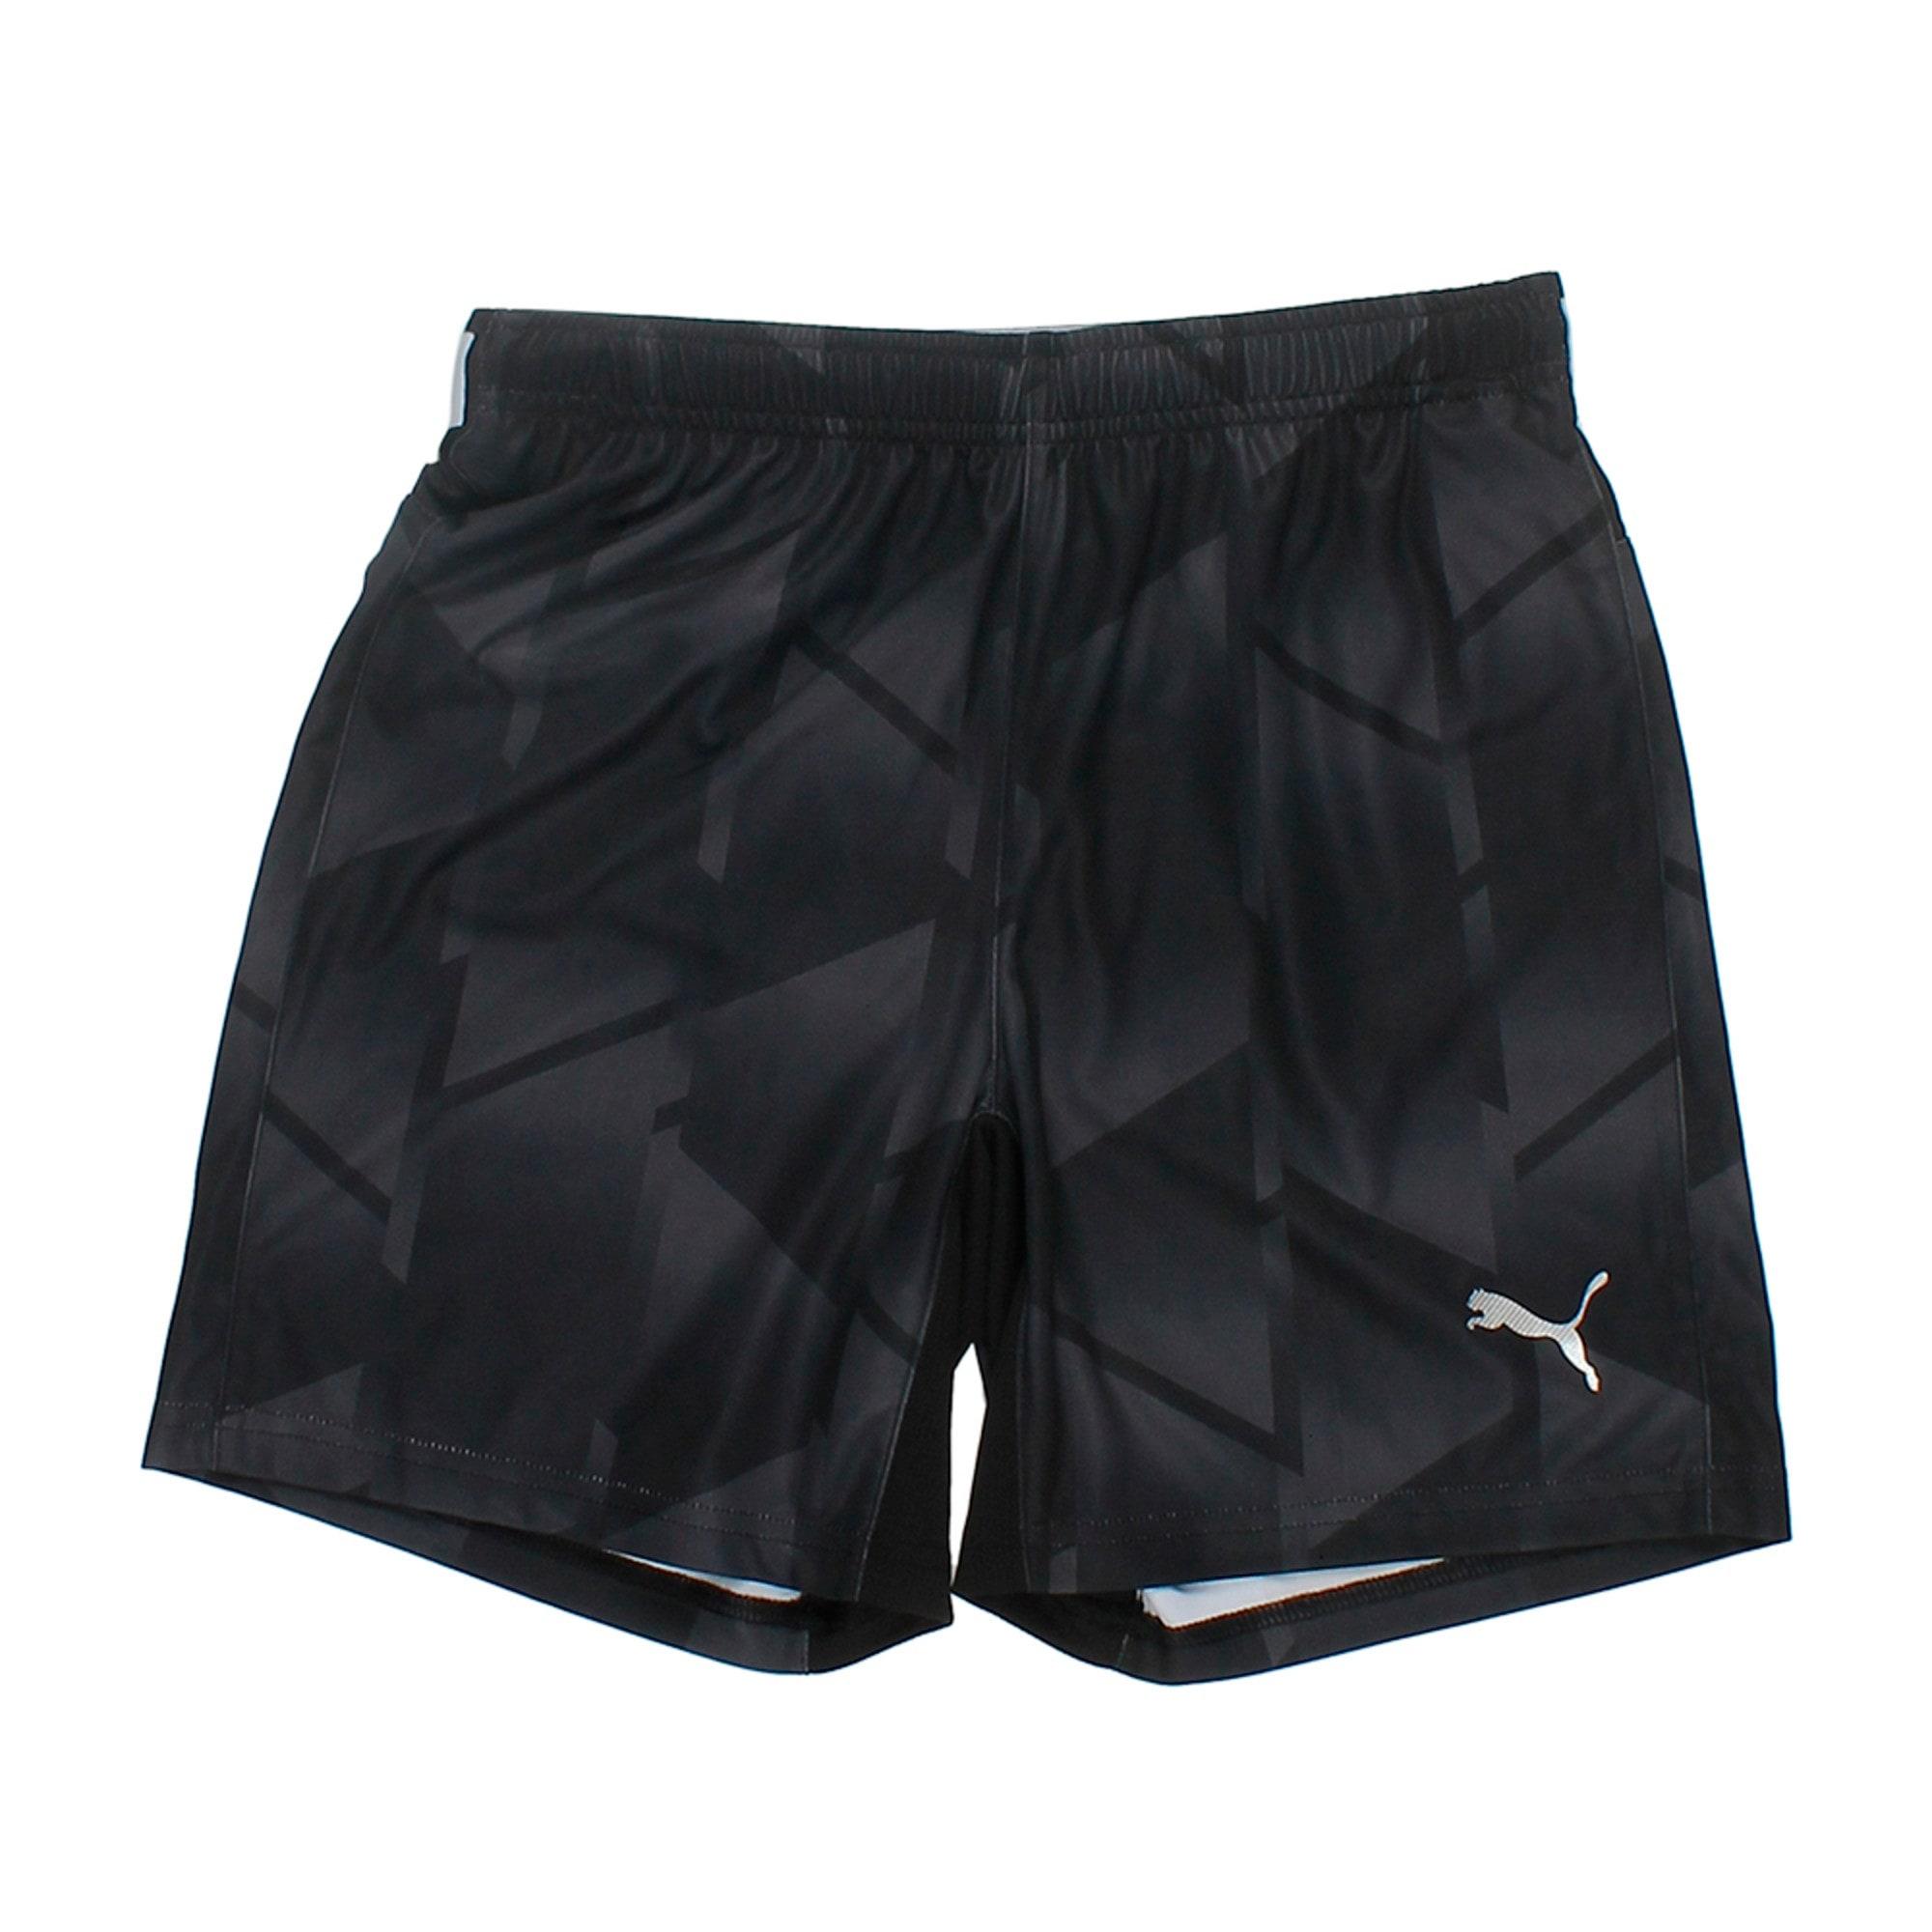 Thumbnail 2 of ftblNXT Pro Shorts Jr Puma Black, Puma Black, medium-IND